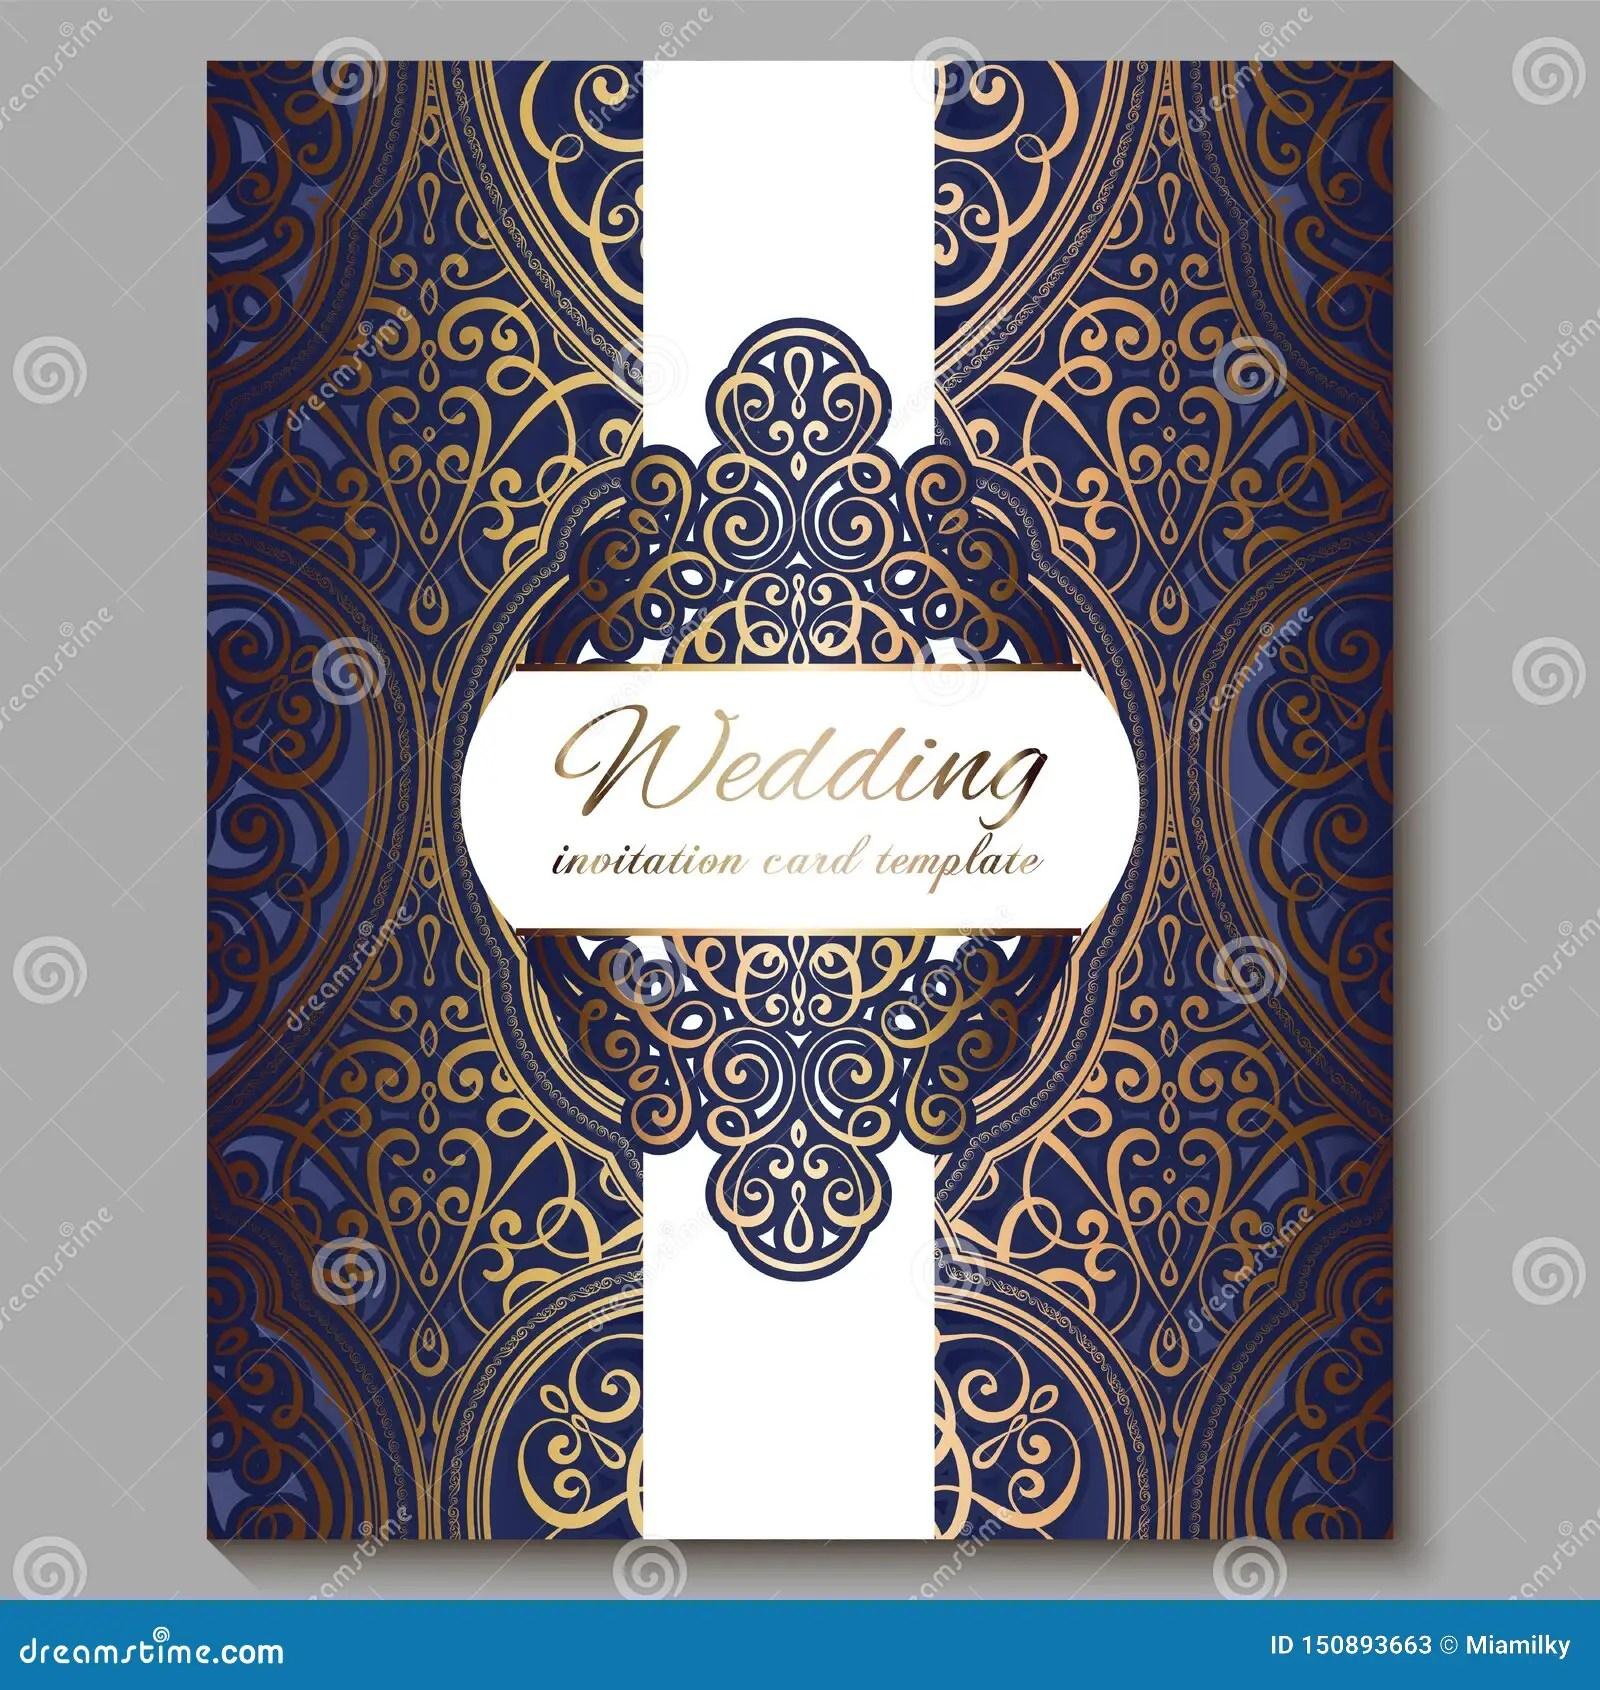 https www dreamstime com wedding invitation card gold shiny eastern baroque rich foliage royal blue ornate islamic background your design image150893663